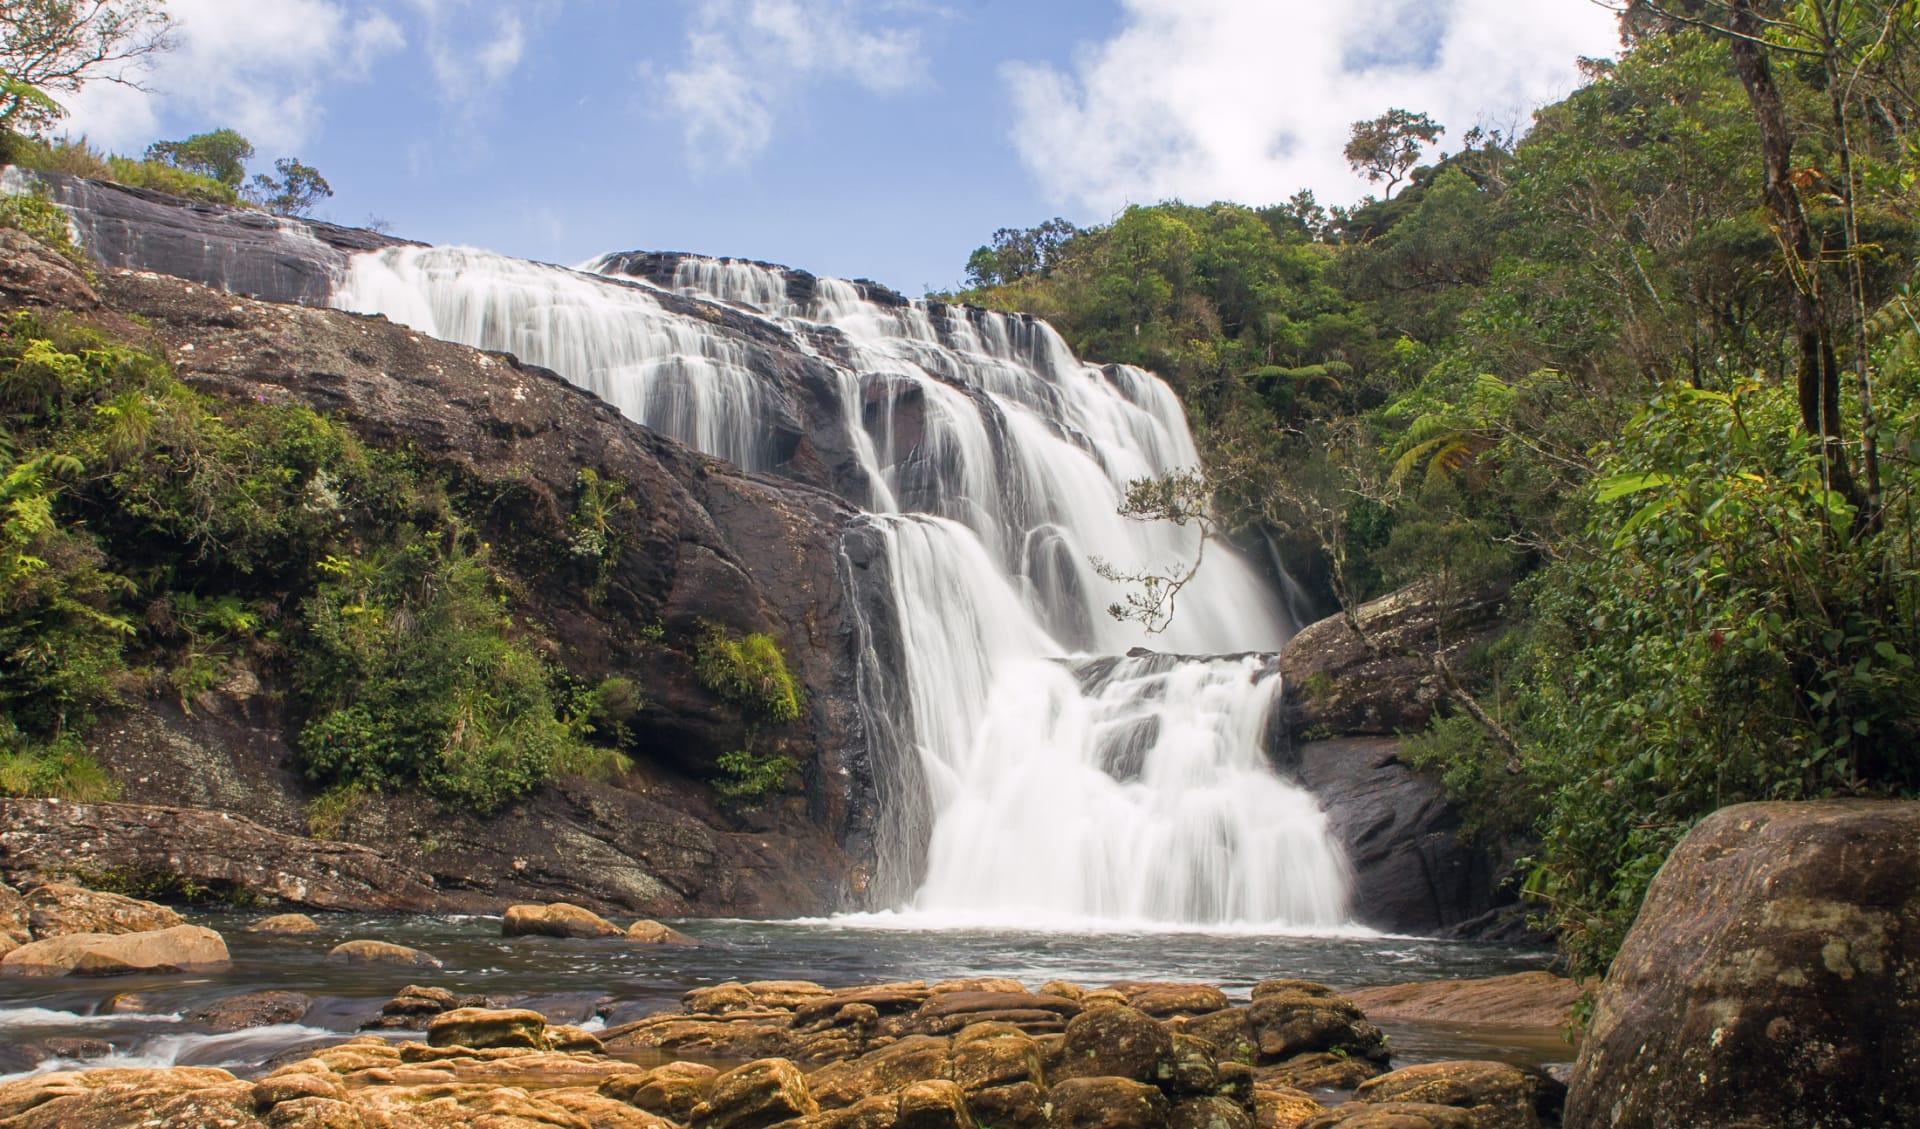 Wasserfall im Nationalpark, Sri Lanka